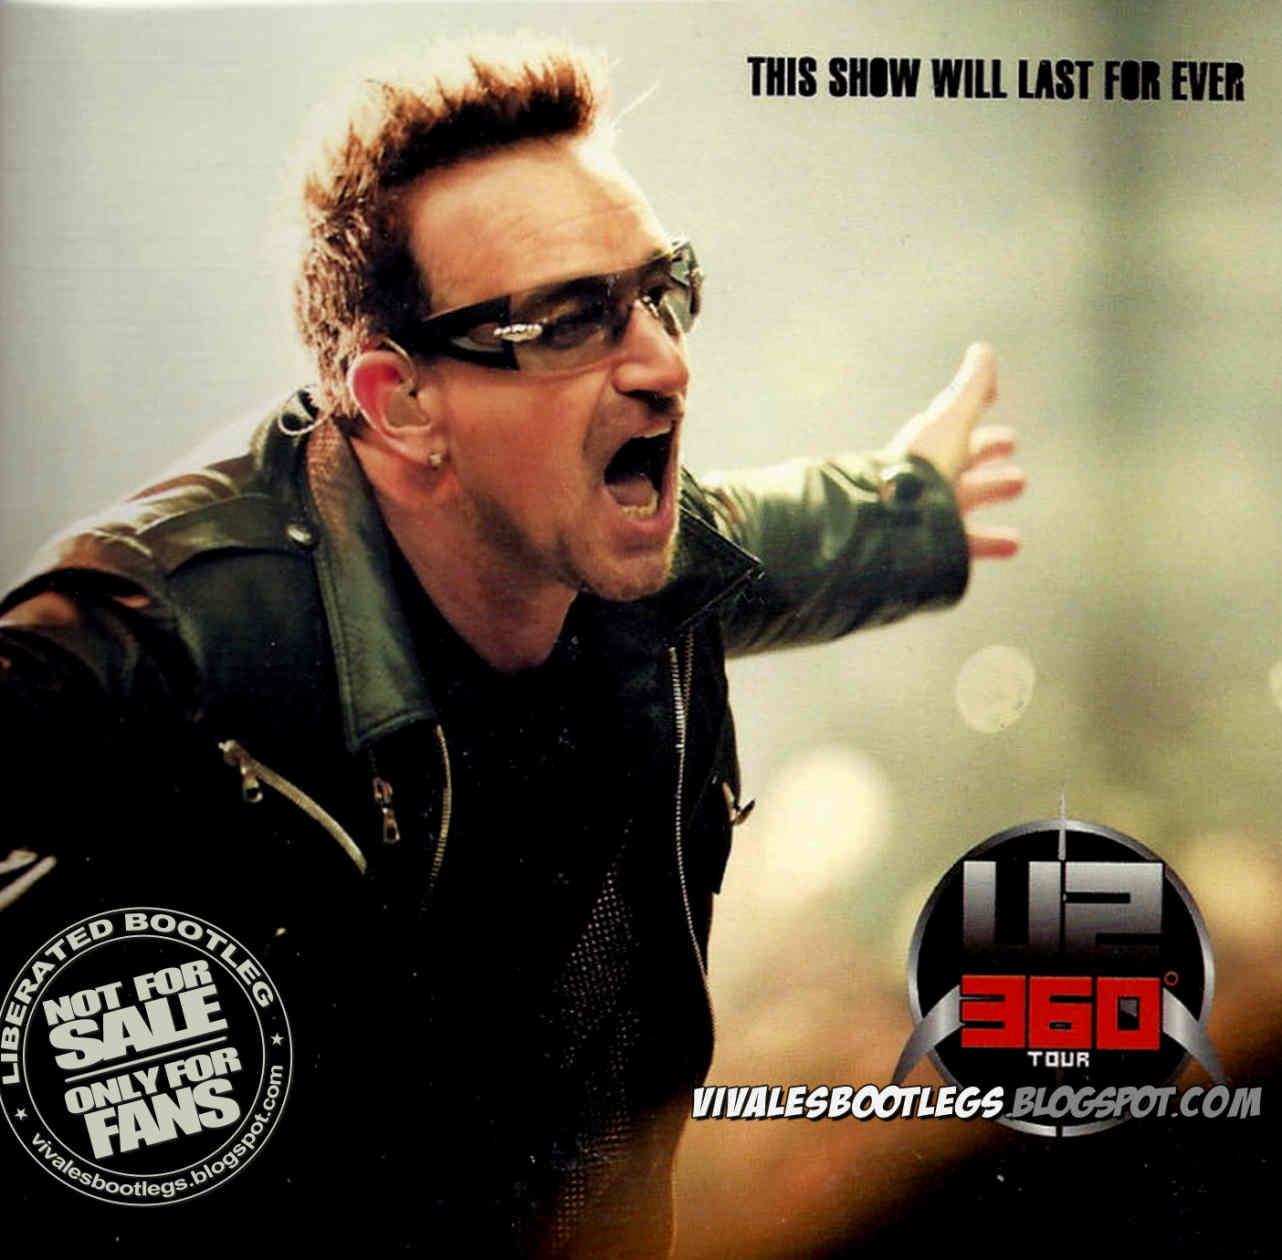 Viva Les Bootlegs: U2: This Show Will Last For Ever  Morumbi